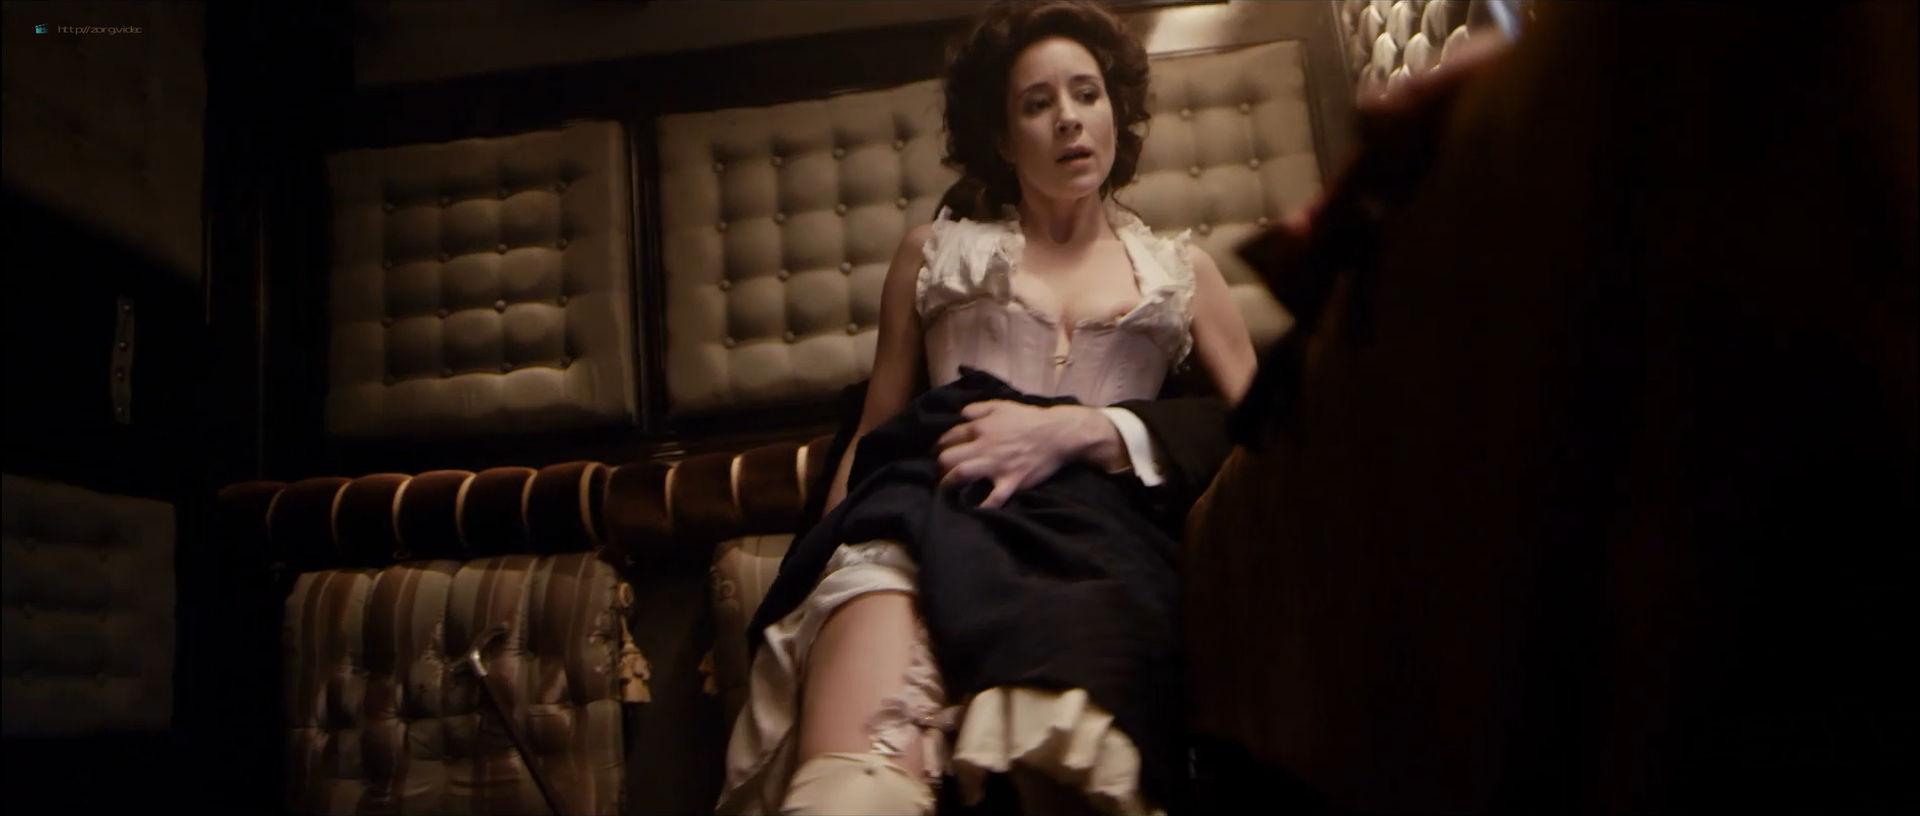 Anastasiya Meskova nude full frontal Olga Sutulova nude sex - Trotsky (2017) s1e1-2 HD 1080p (4)